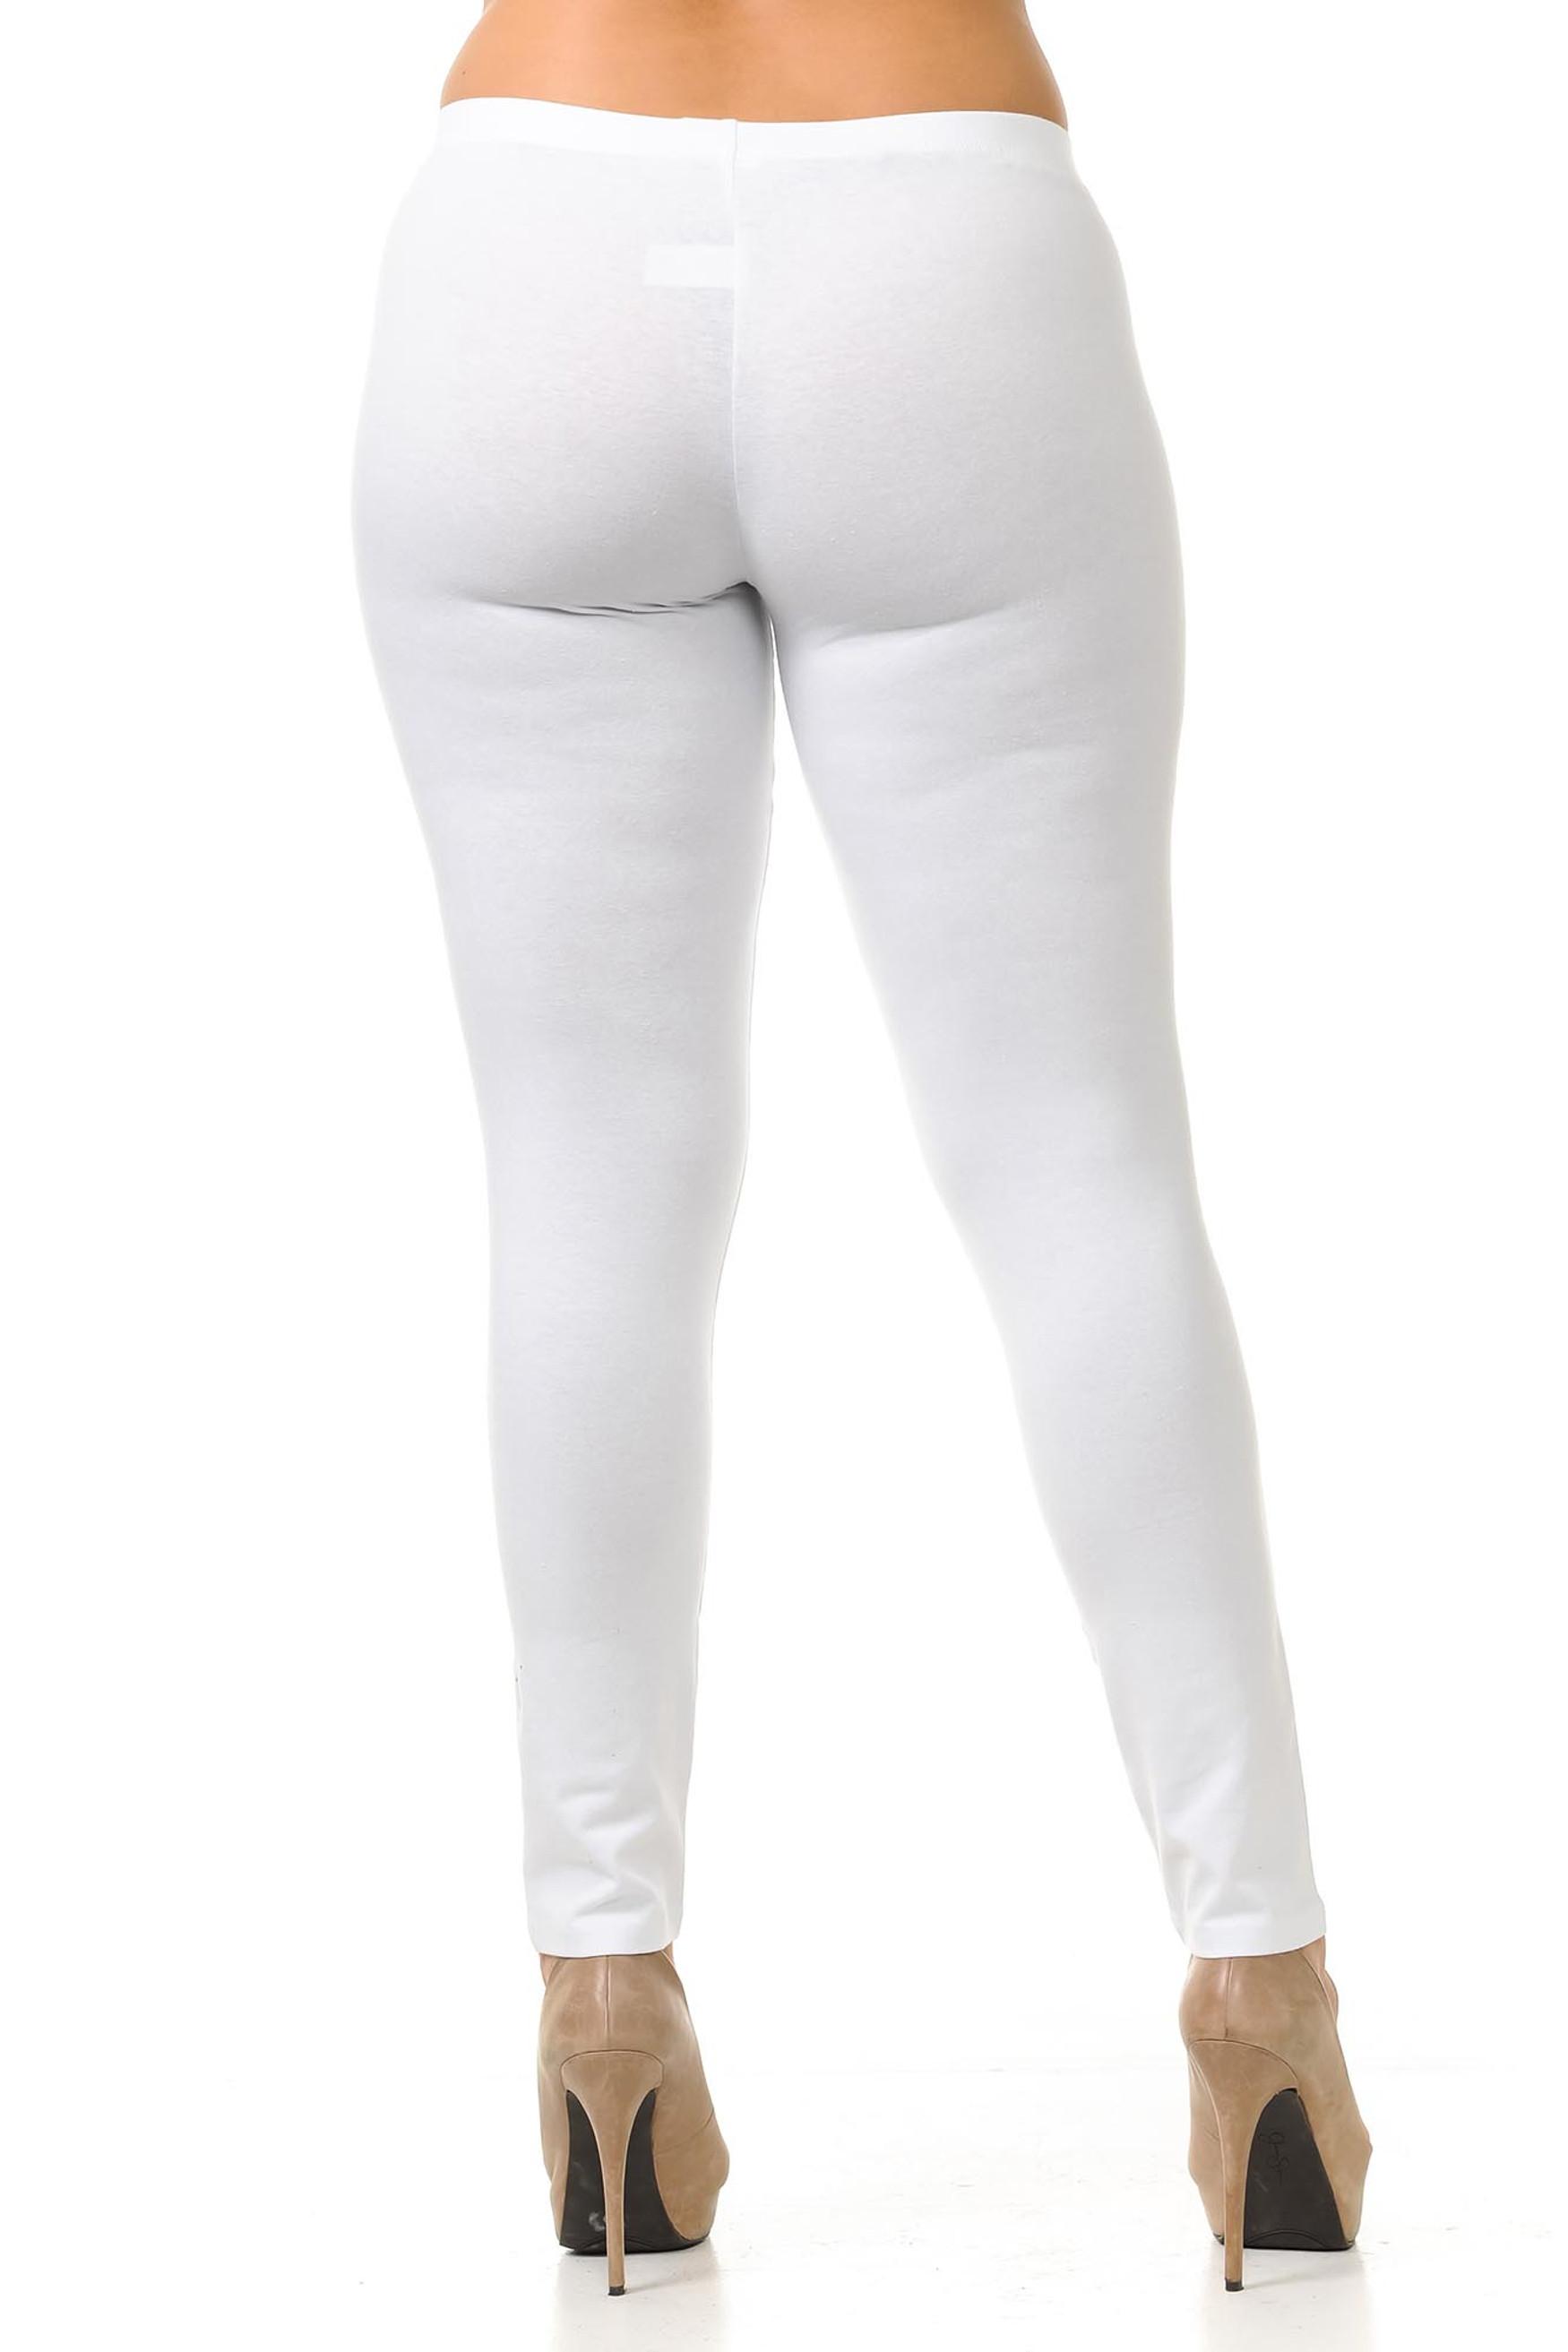 Rear view image of White USA Cotton Full Length Leggings - Plus Size